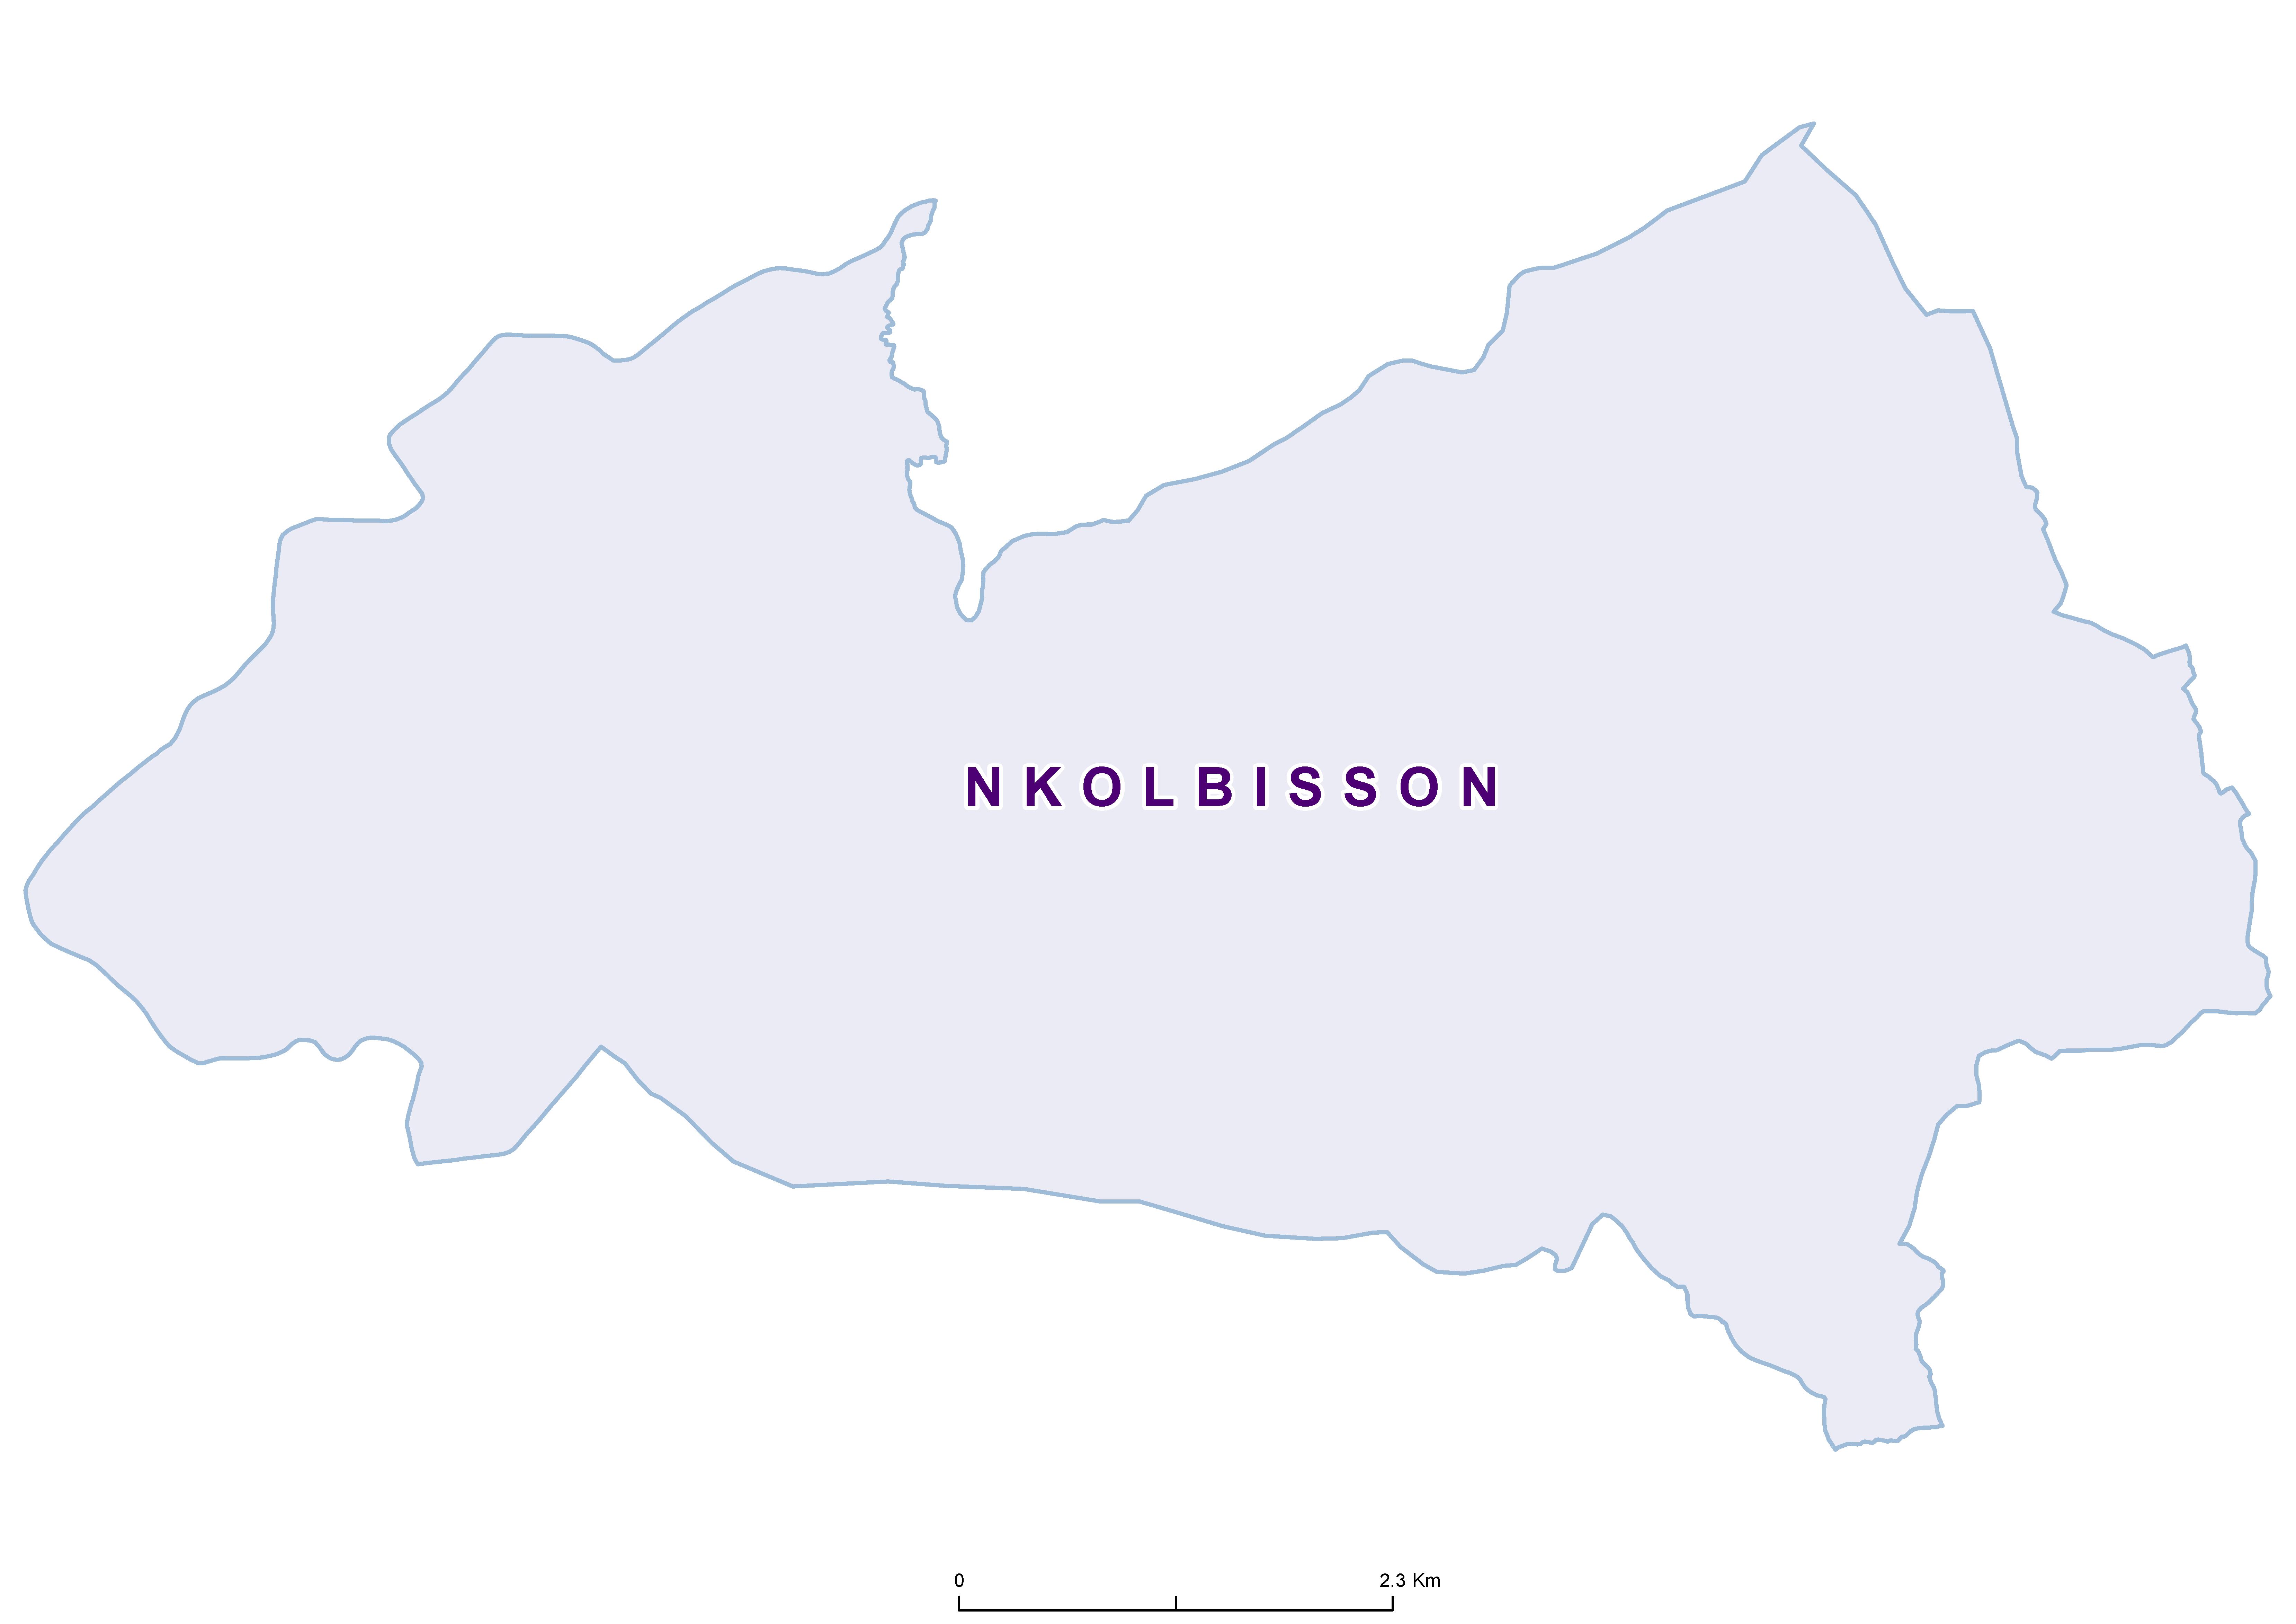 Nkolbisson Max SCH 19850001